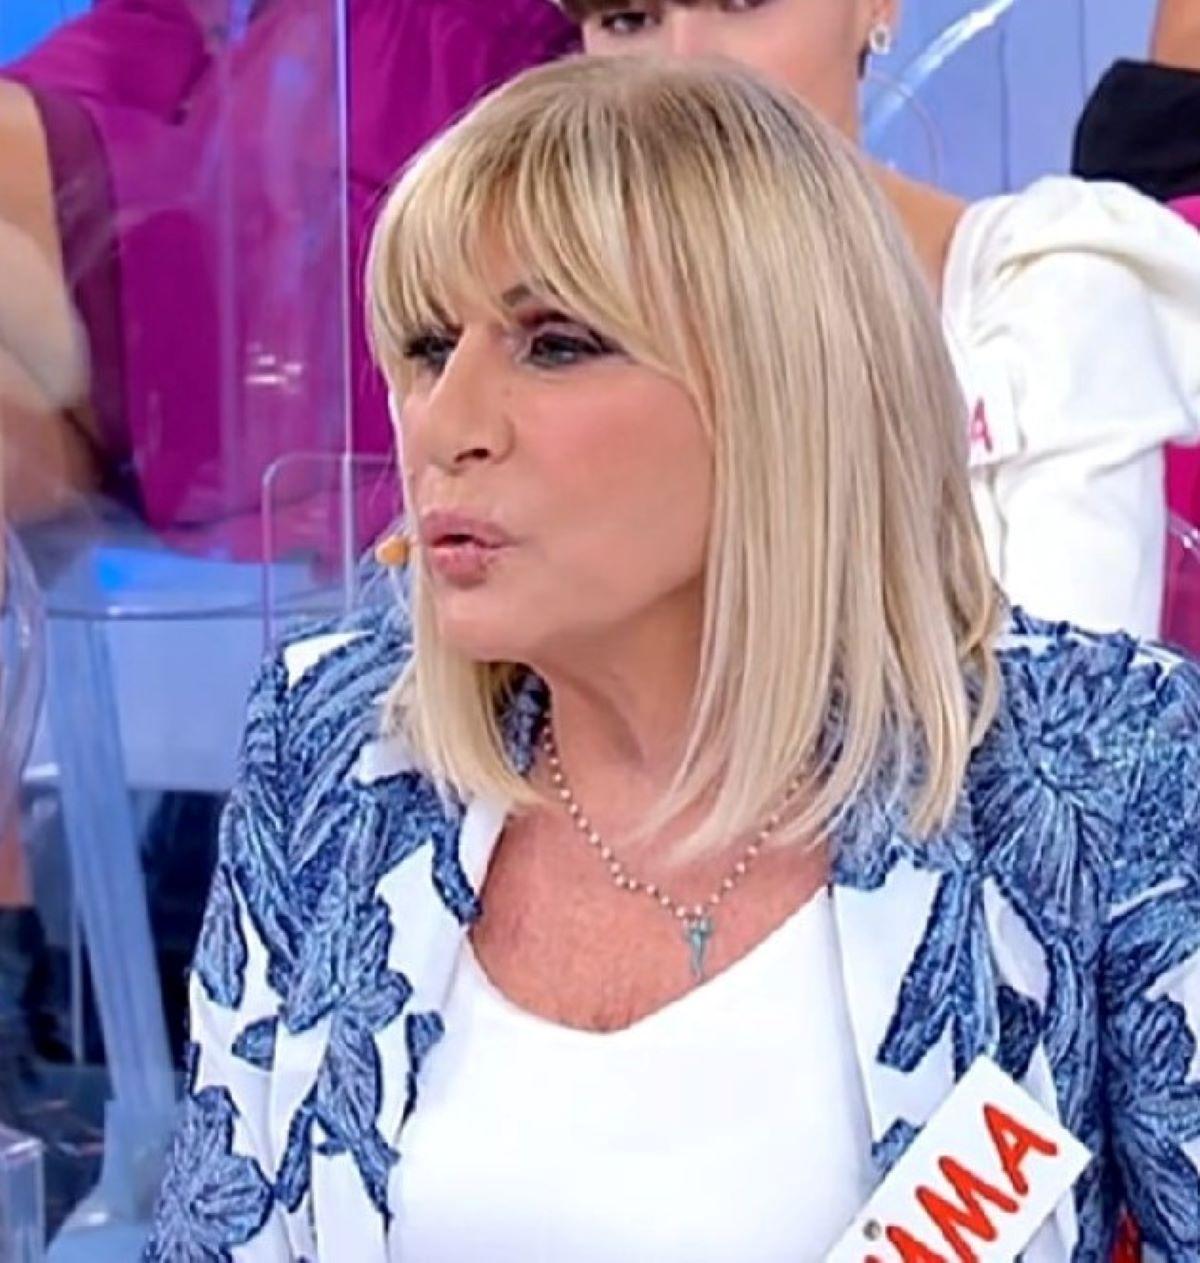 Gemma Galgani UeD Attacco Barbara De Santi